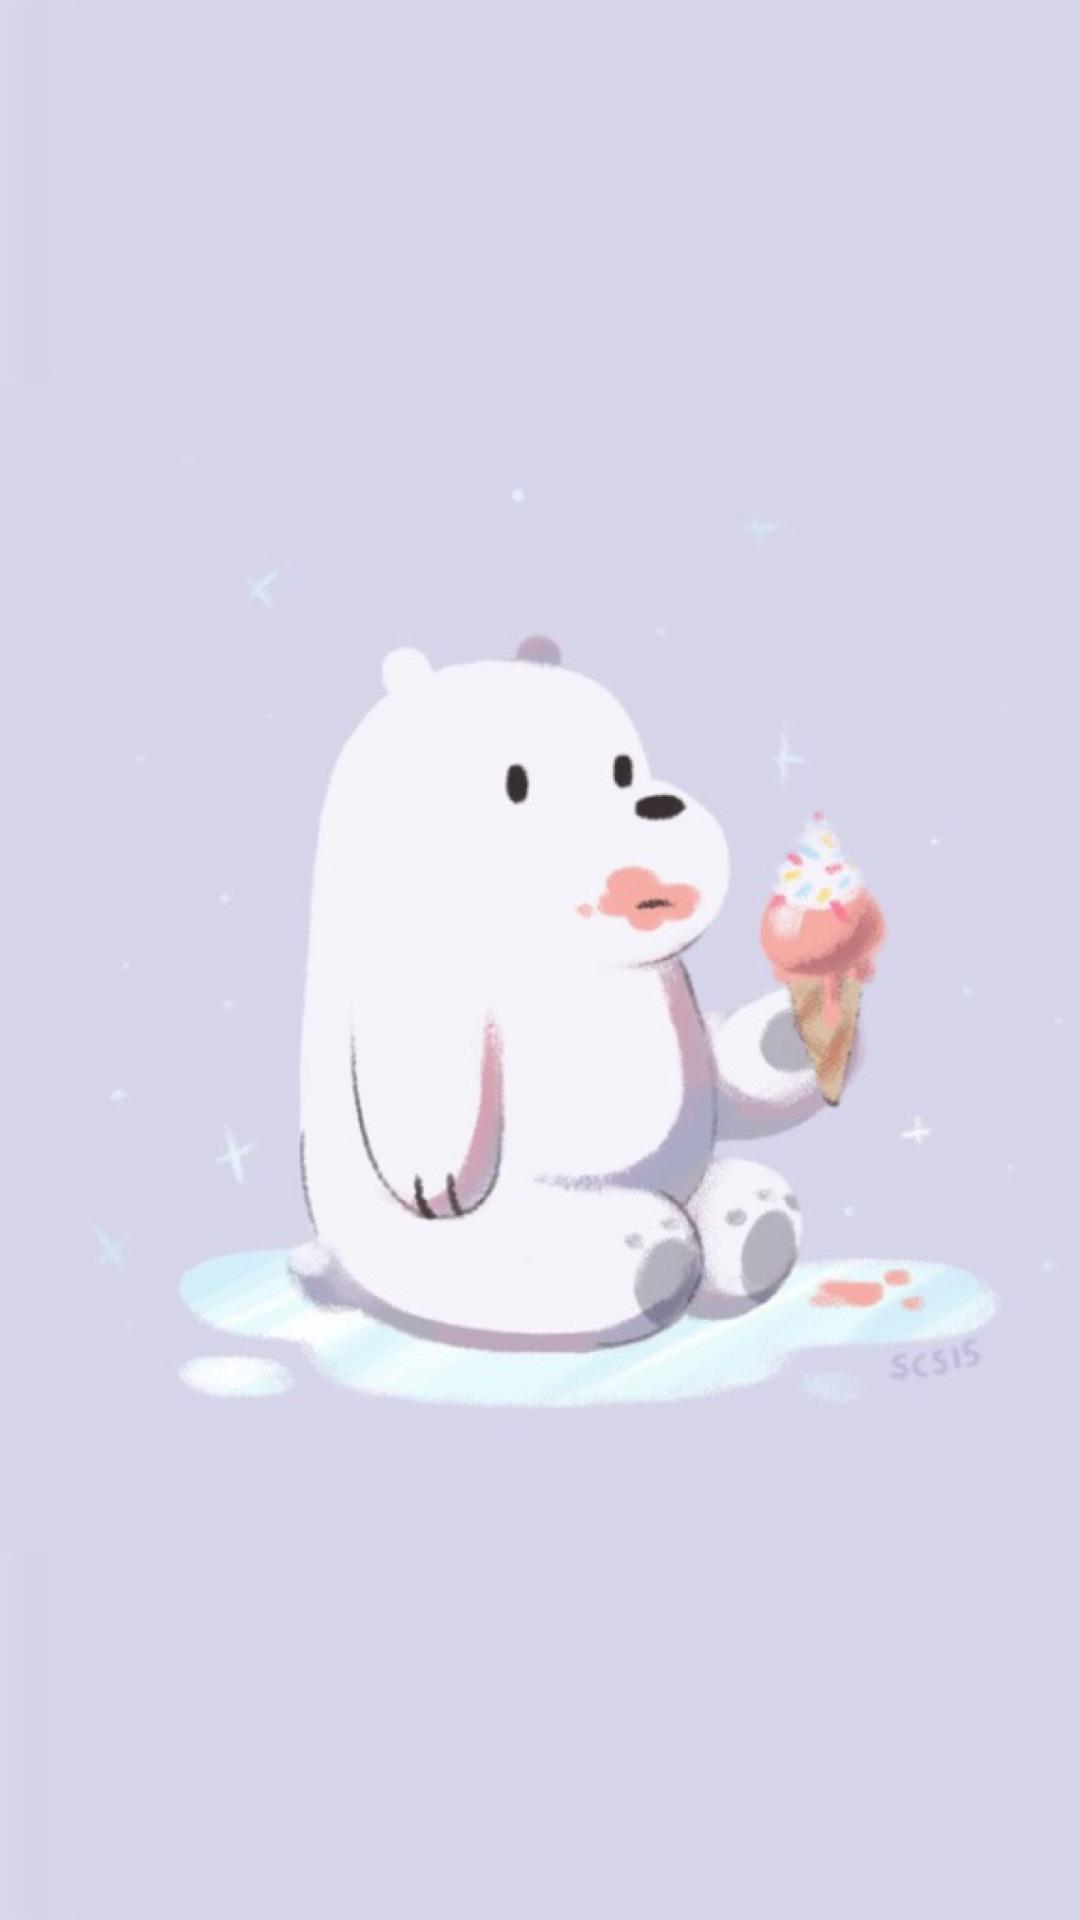 Ice Bear We Bare Bears Phone Wallpaper